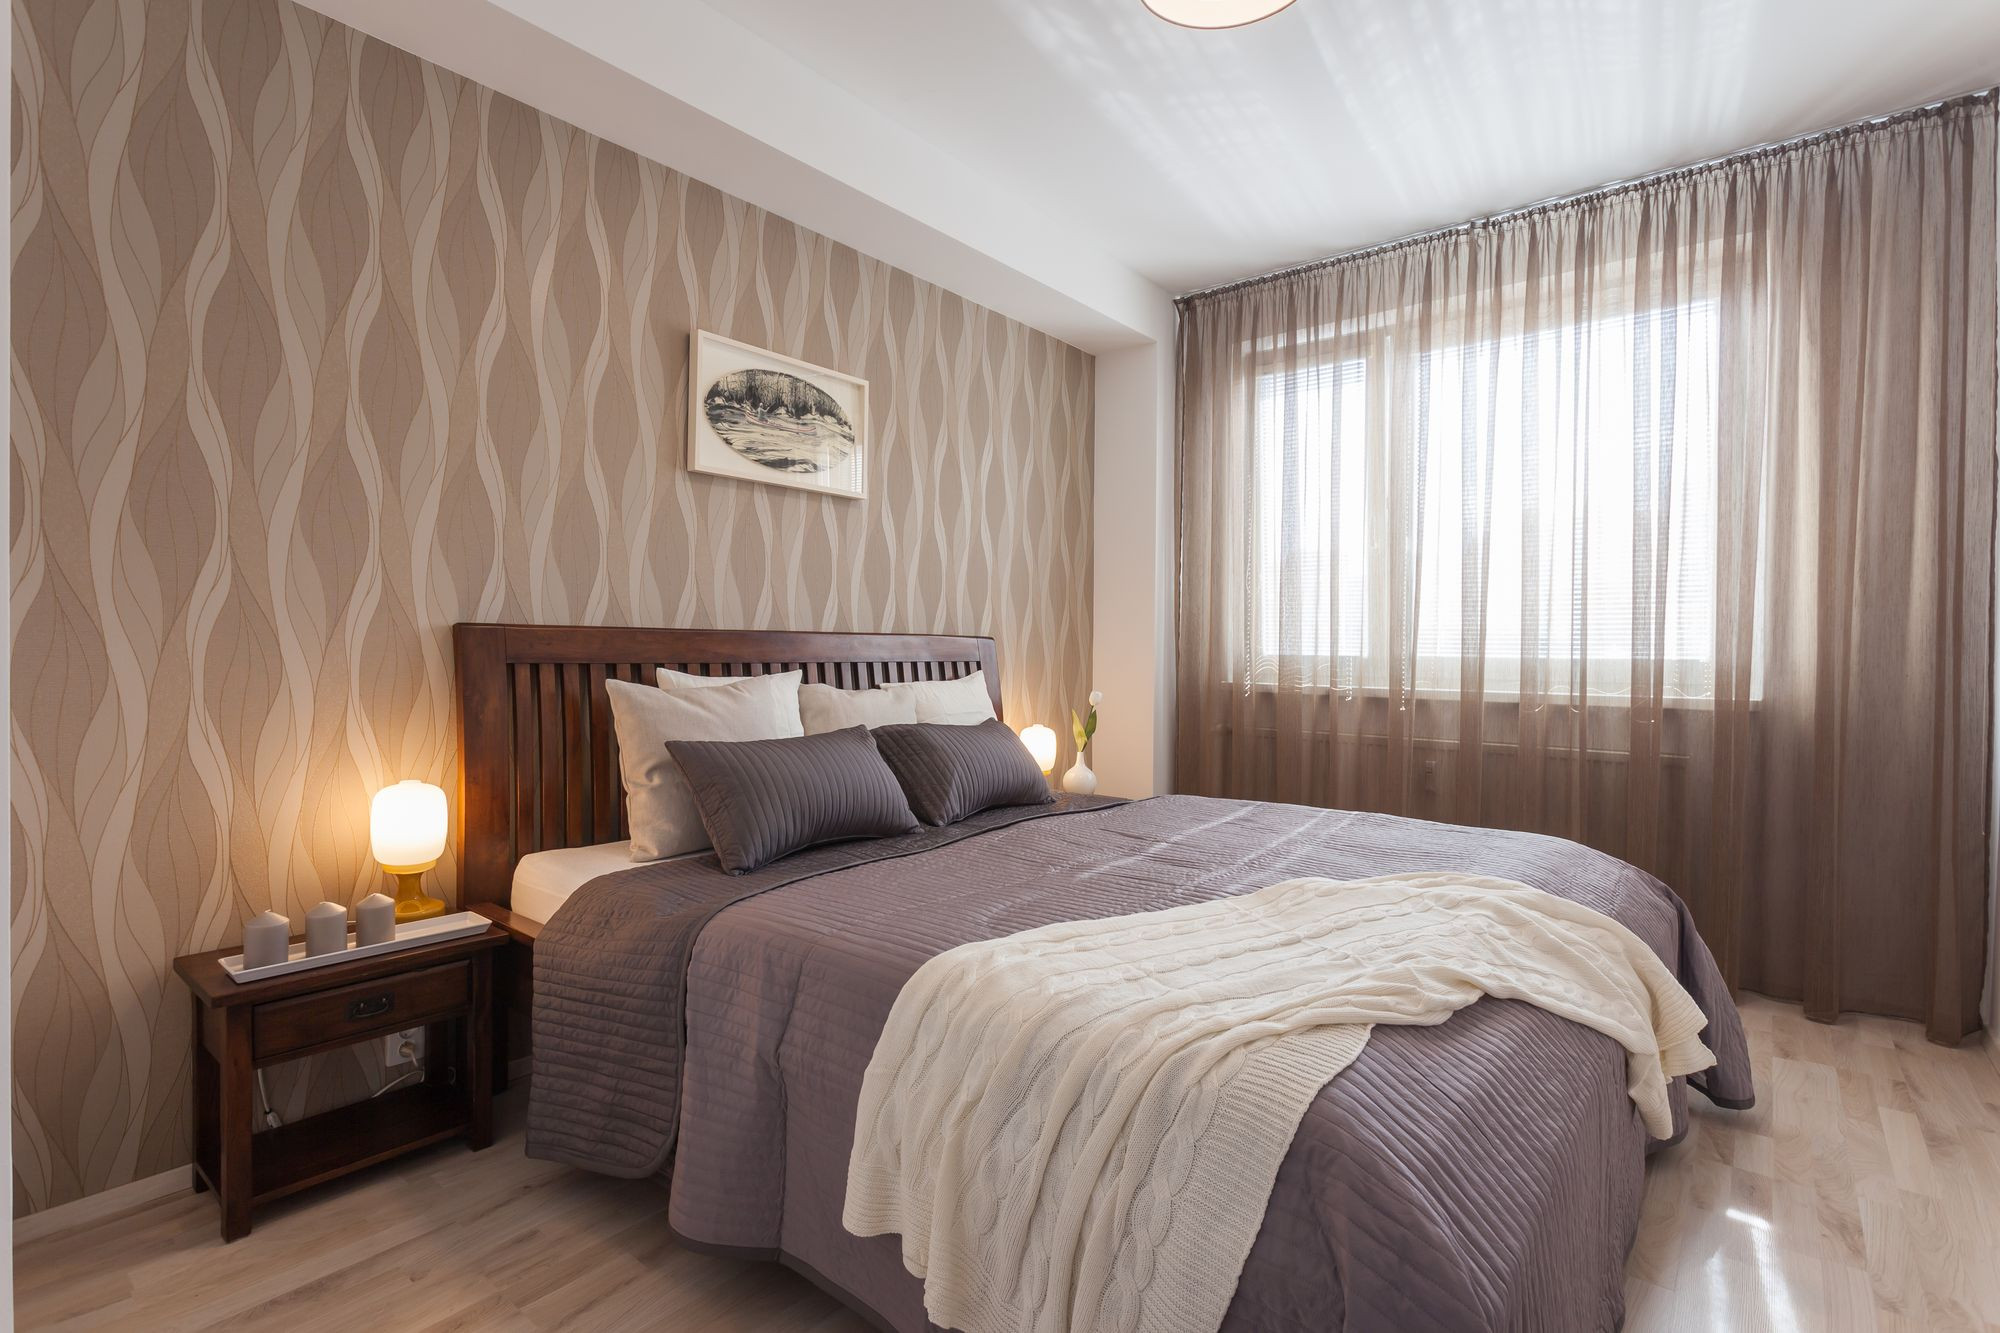 Manželská posteľ s drevenými nočnými stolíkmi